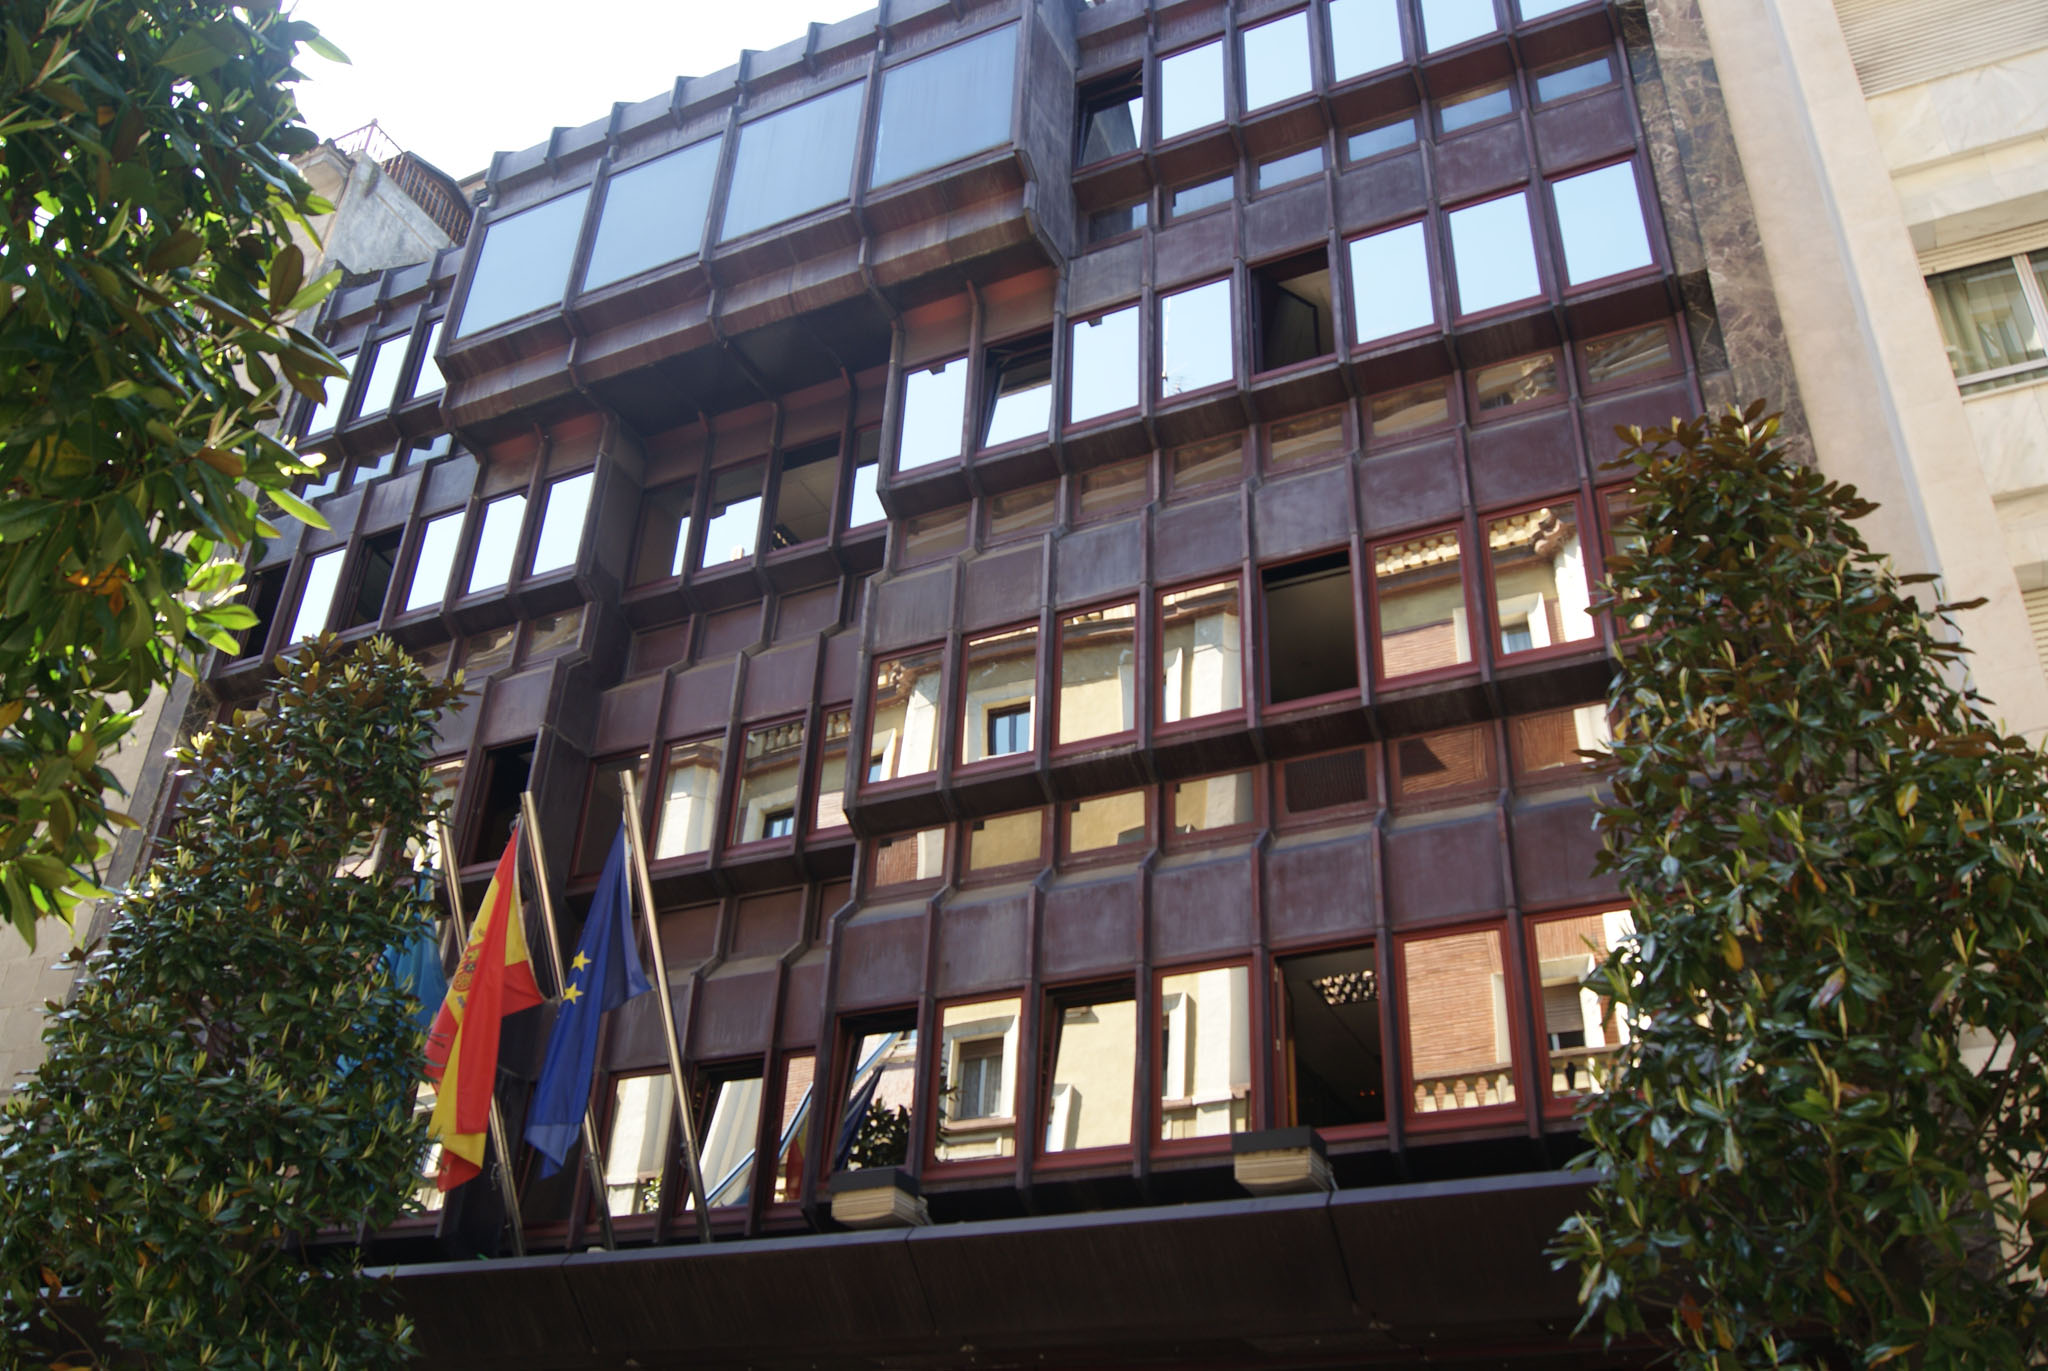 Edificio Hacienda – Calle Gil de Jaz – Oviedo